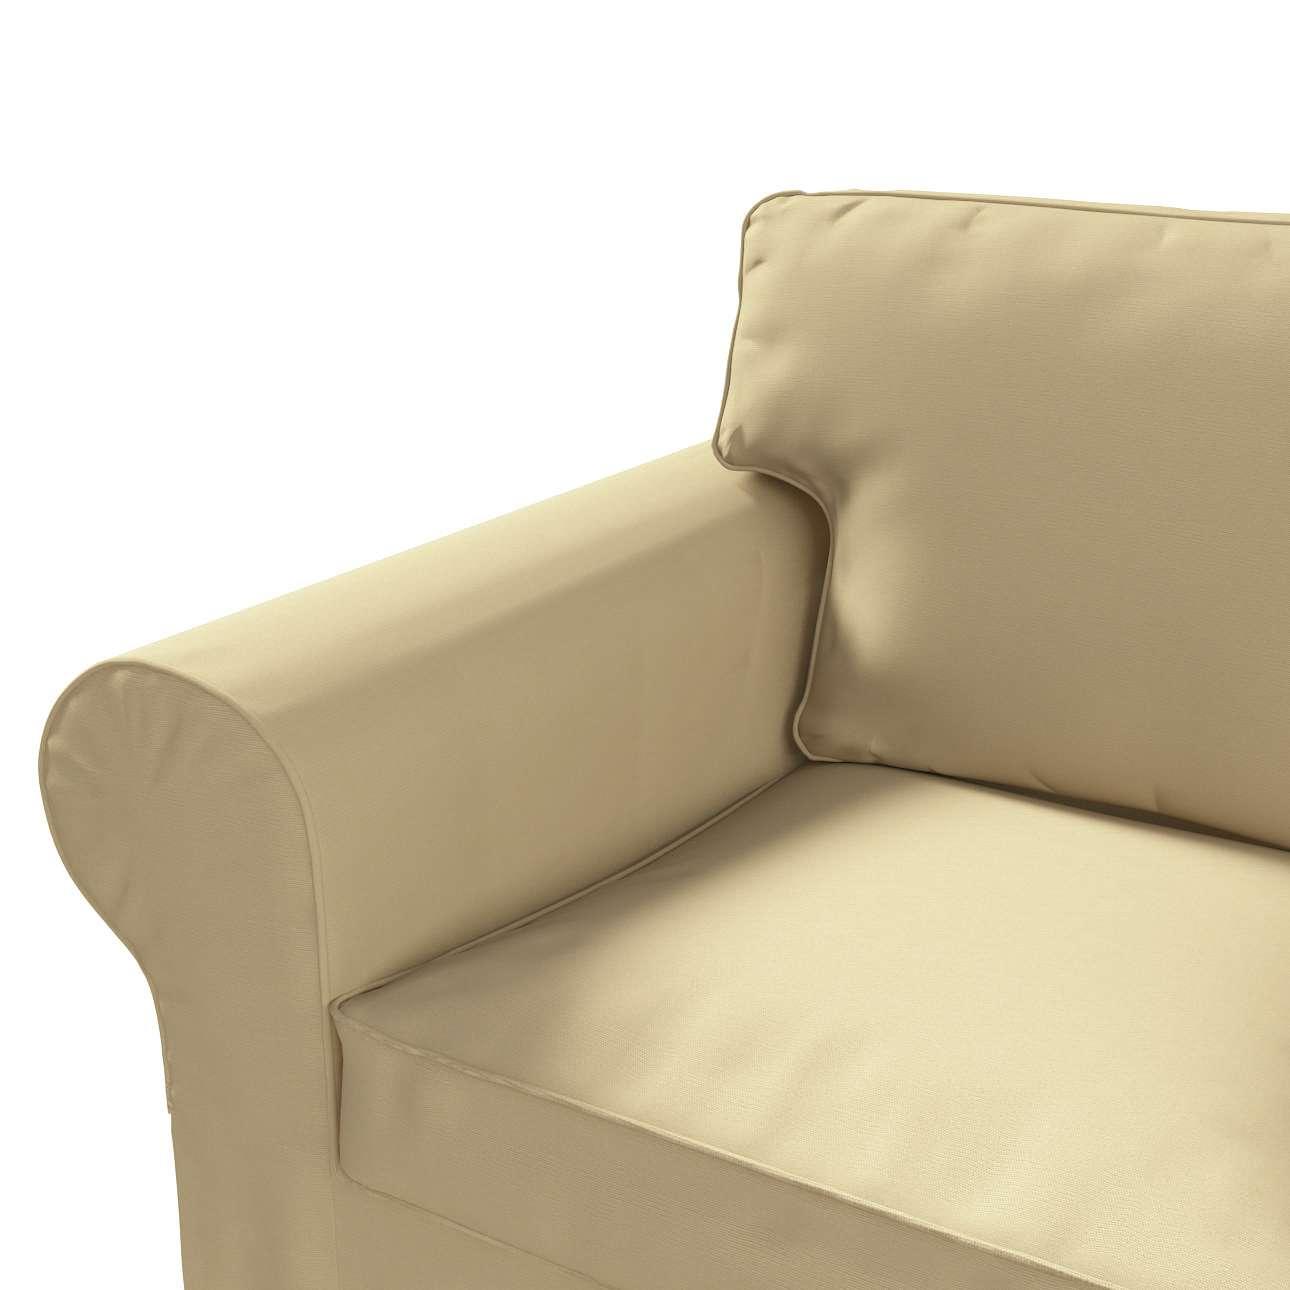 Ektorp 2-Sitzer Sofabezug nicht ausklappbar Sofabezug für  Ektorp 2-Sitzer nicht ausklappbar von der Kollektion Cotton Panama, Stoff: 702-01